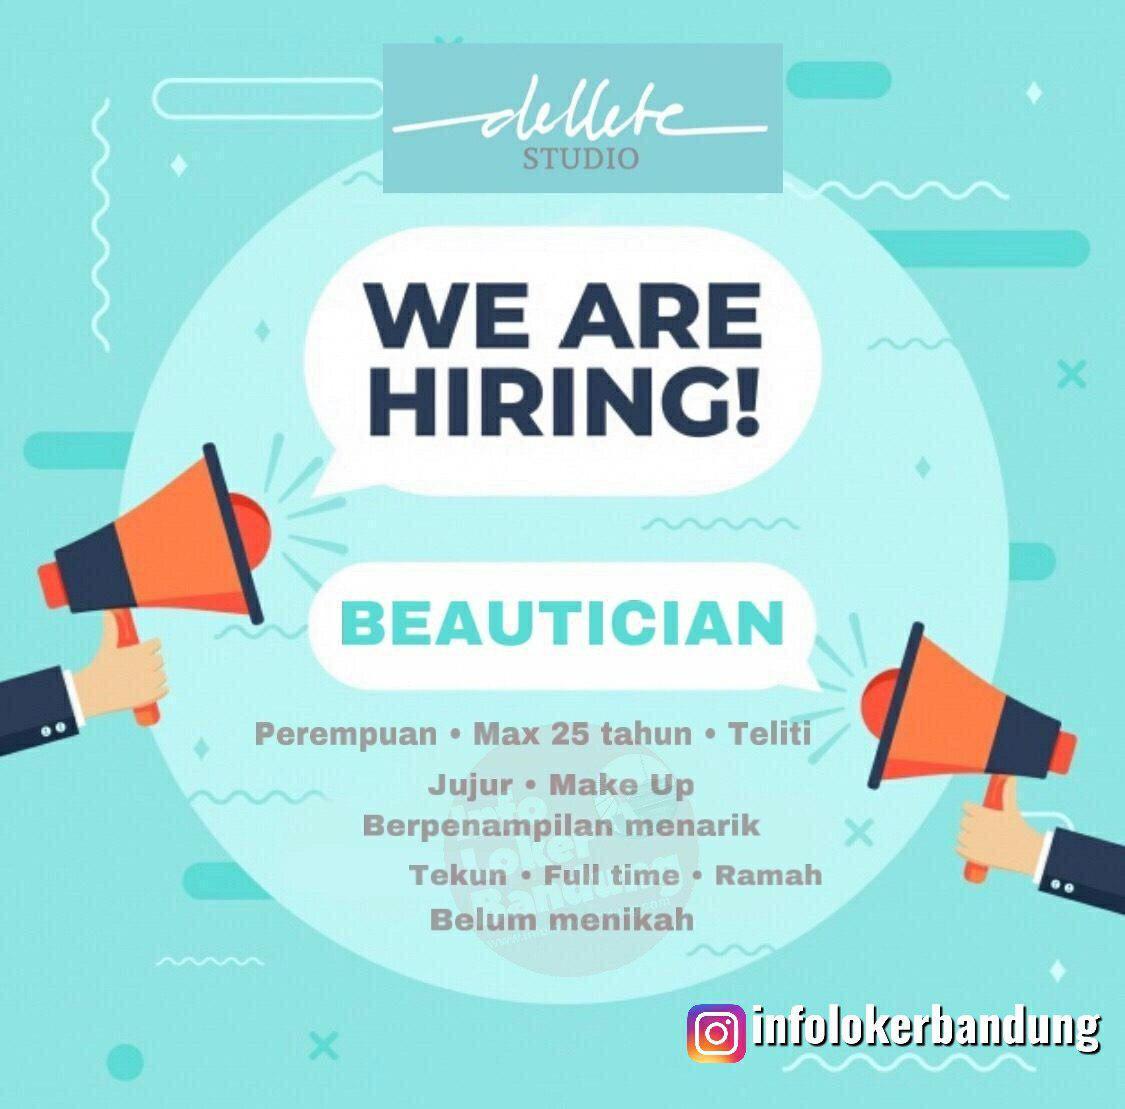 Lowongan Kerja Beautician Dellete Studio Bandung Juli 2019